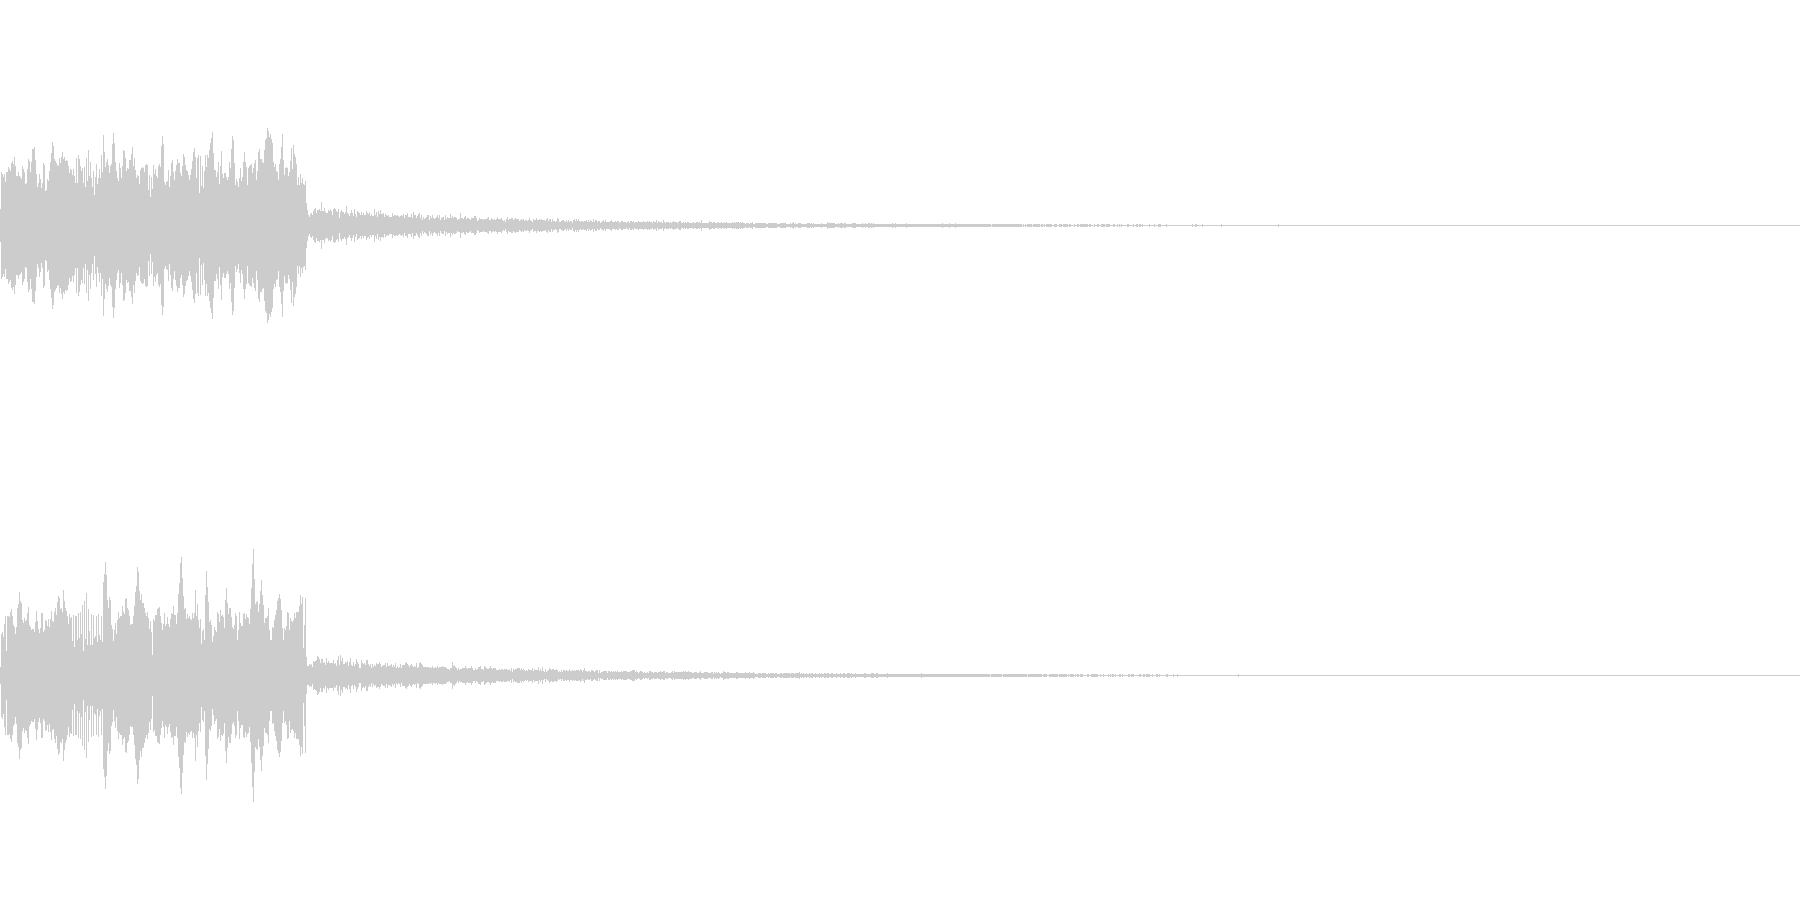 SE ラジオDJ用盛り上げ効果音 1の未再生の波形